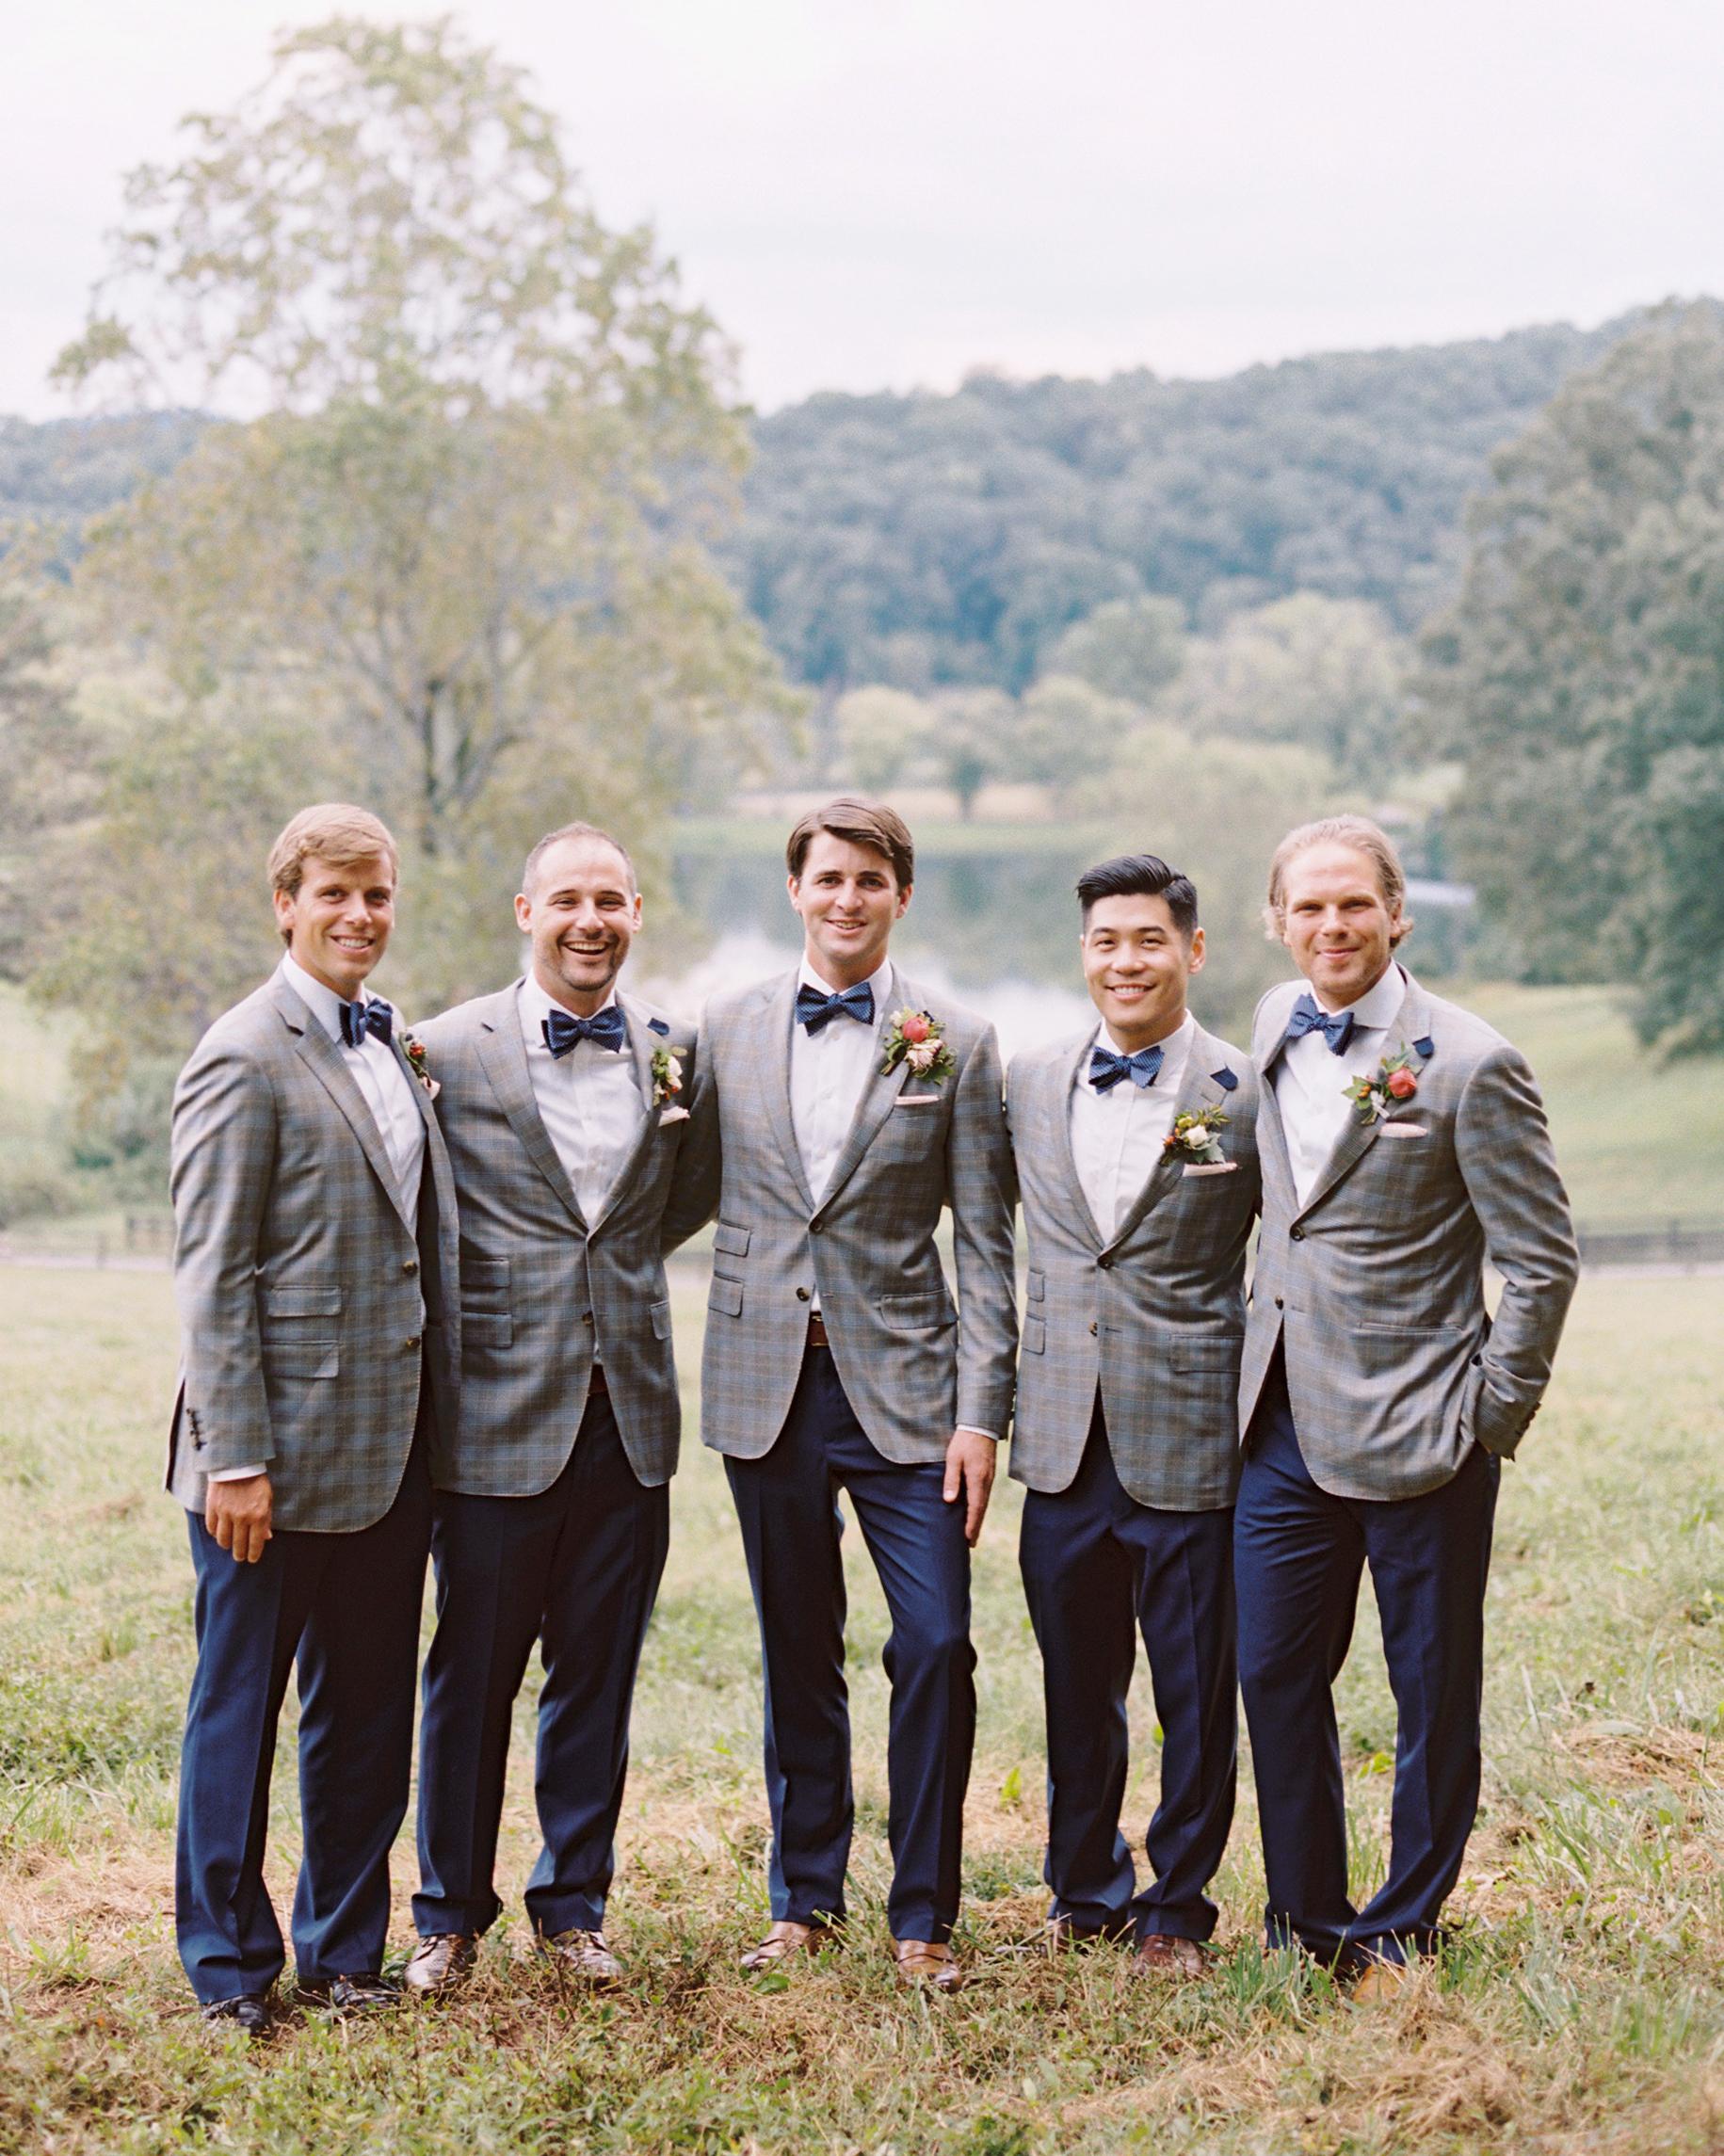 michelle-john-wedding-north-carolina-4-s111840-0215.jpg